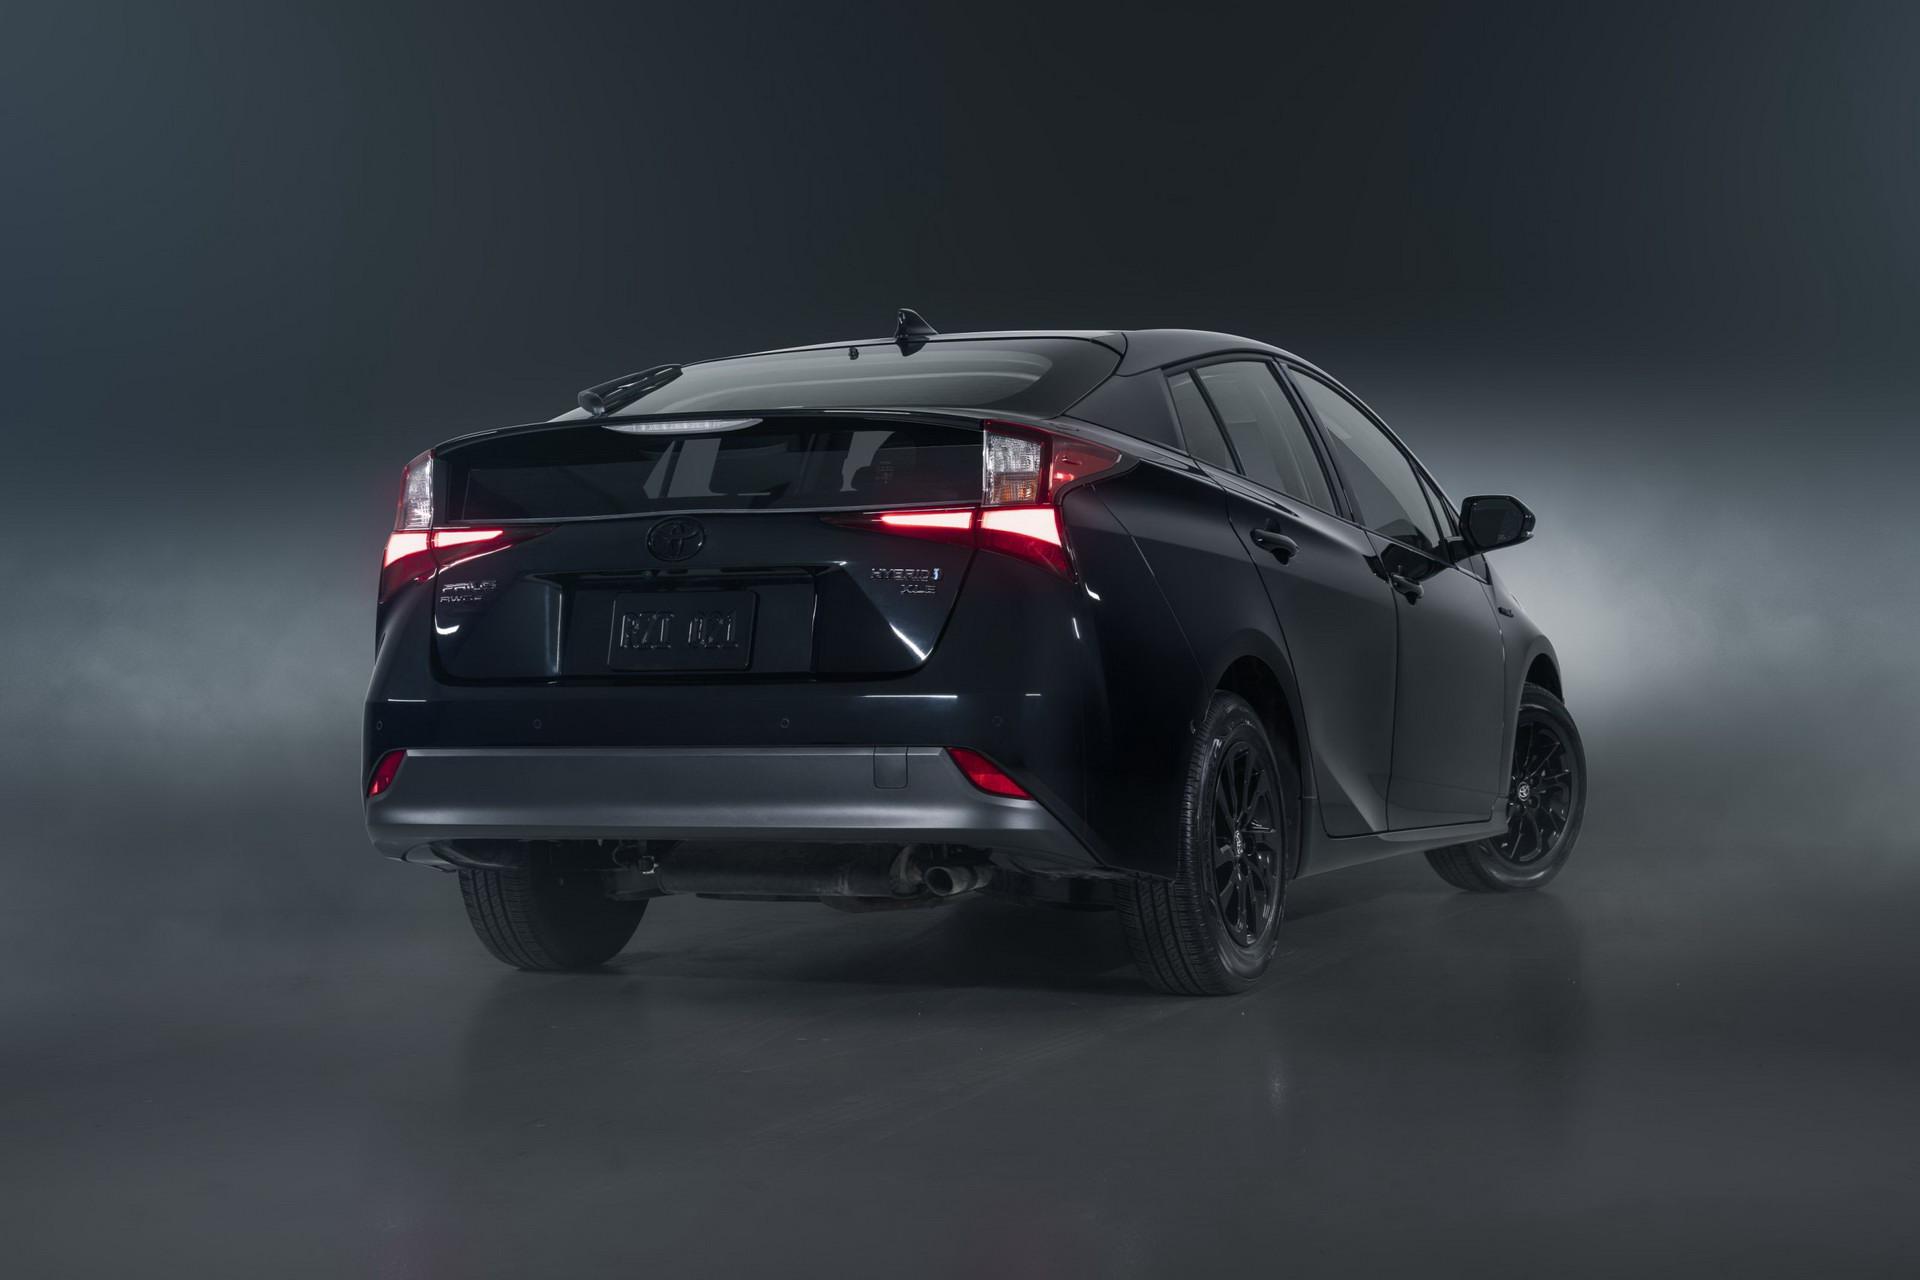 Toyota-Prius-Nightshade-Edition-6